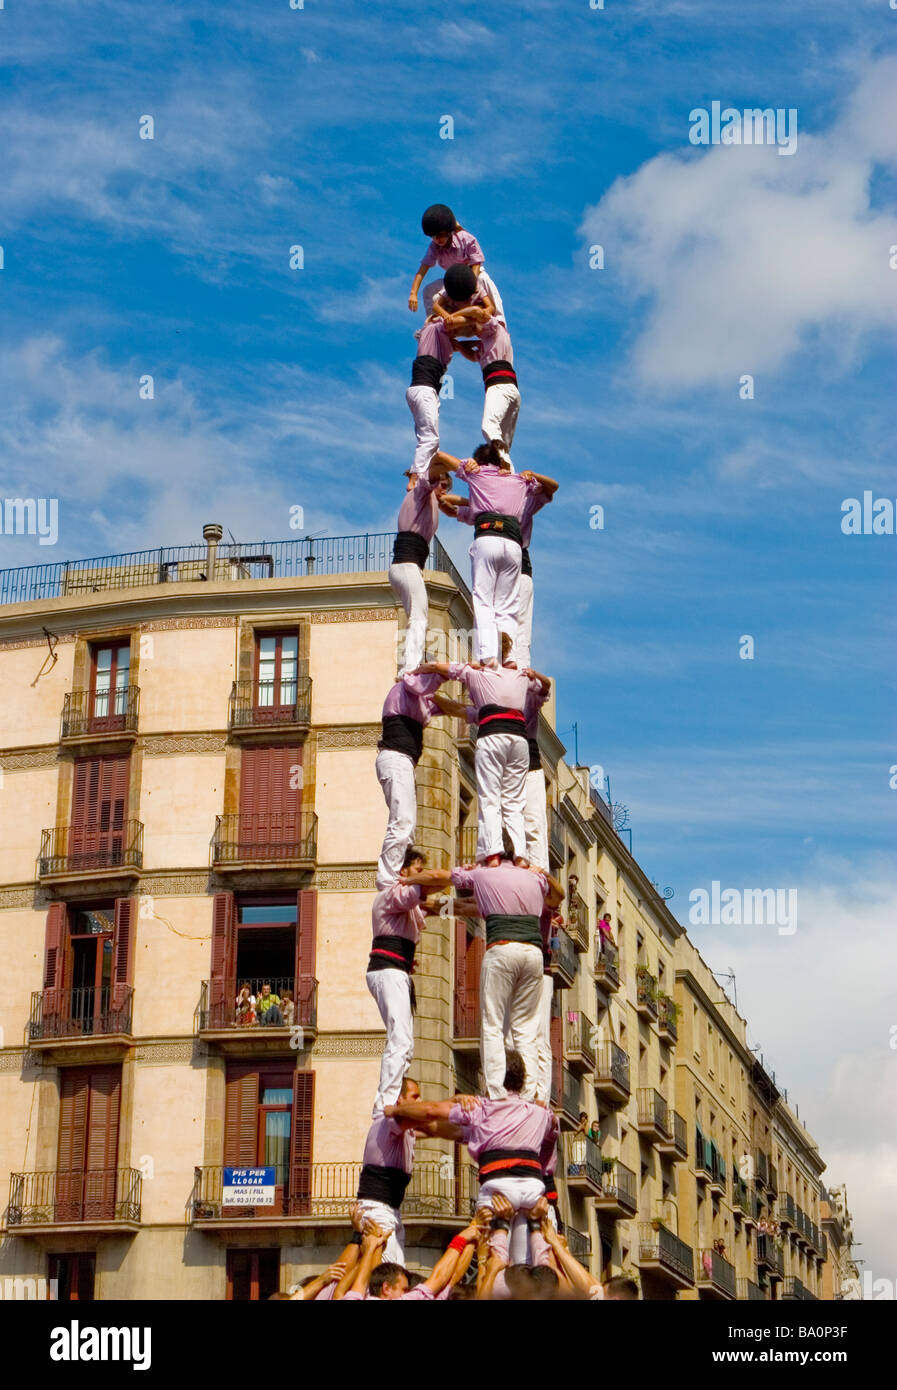 Castellers Competition during the La Merce Festival in Placa de Sant Jaume Barcelona Spain - Stock Image